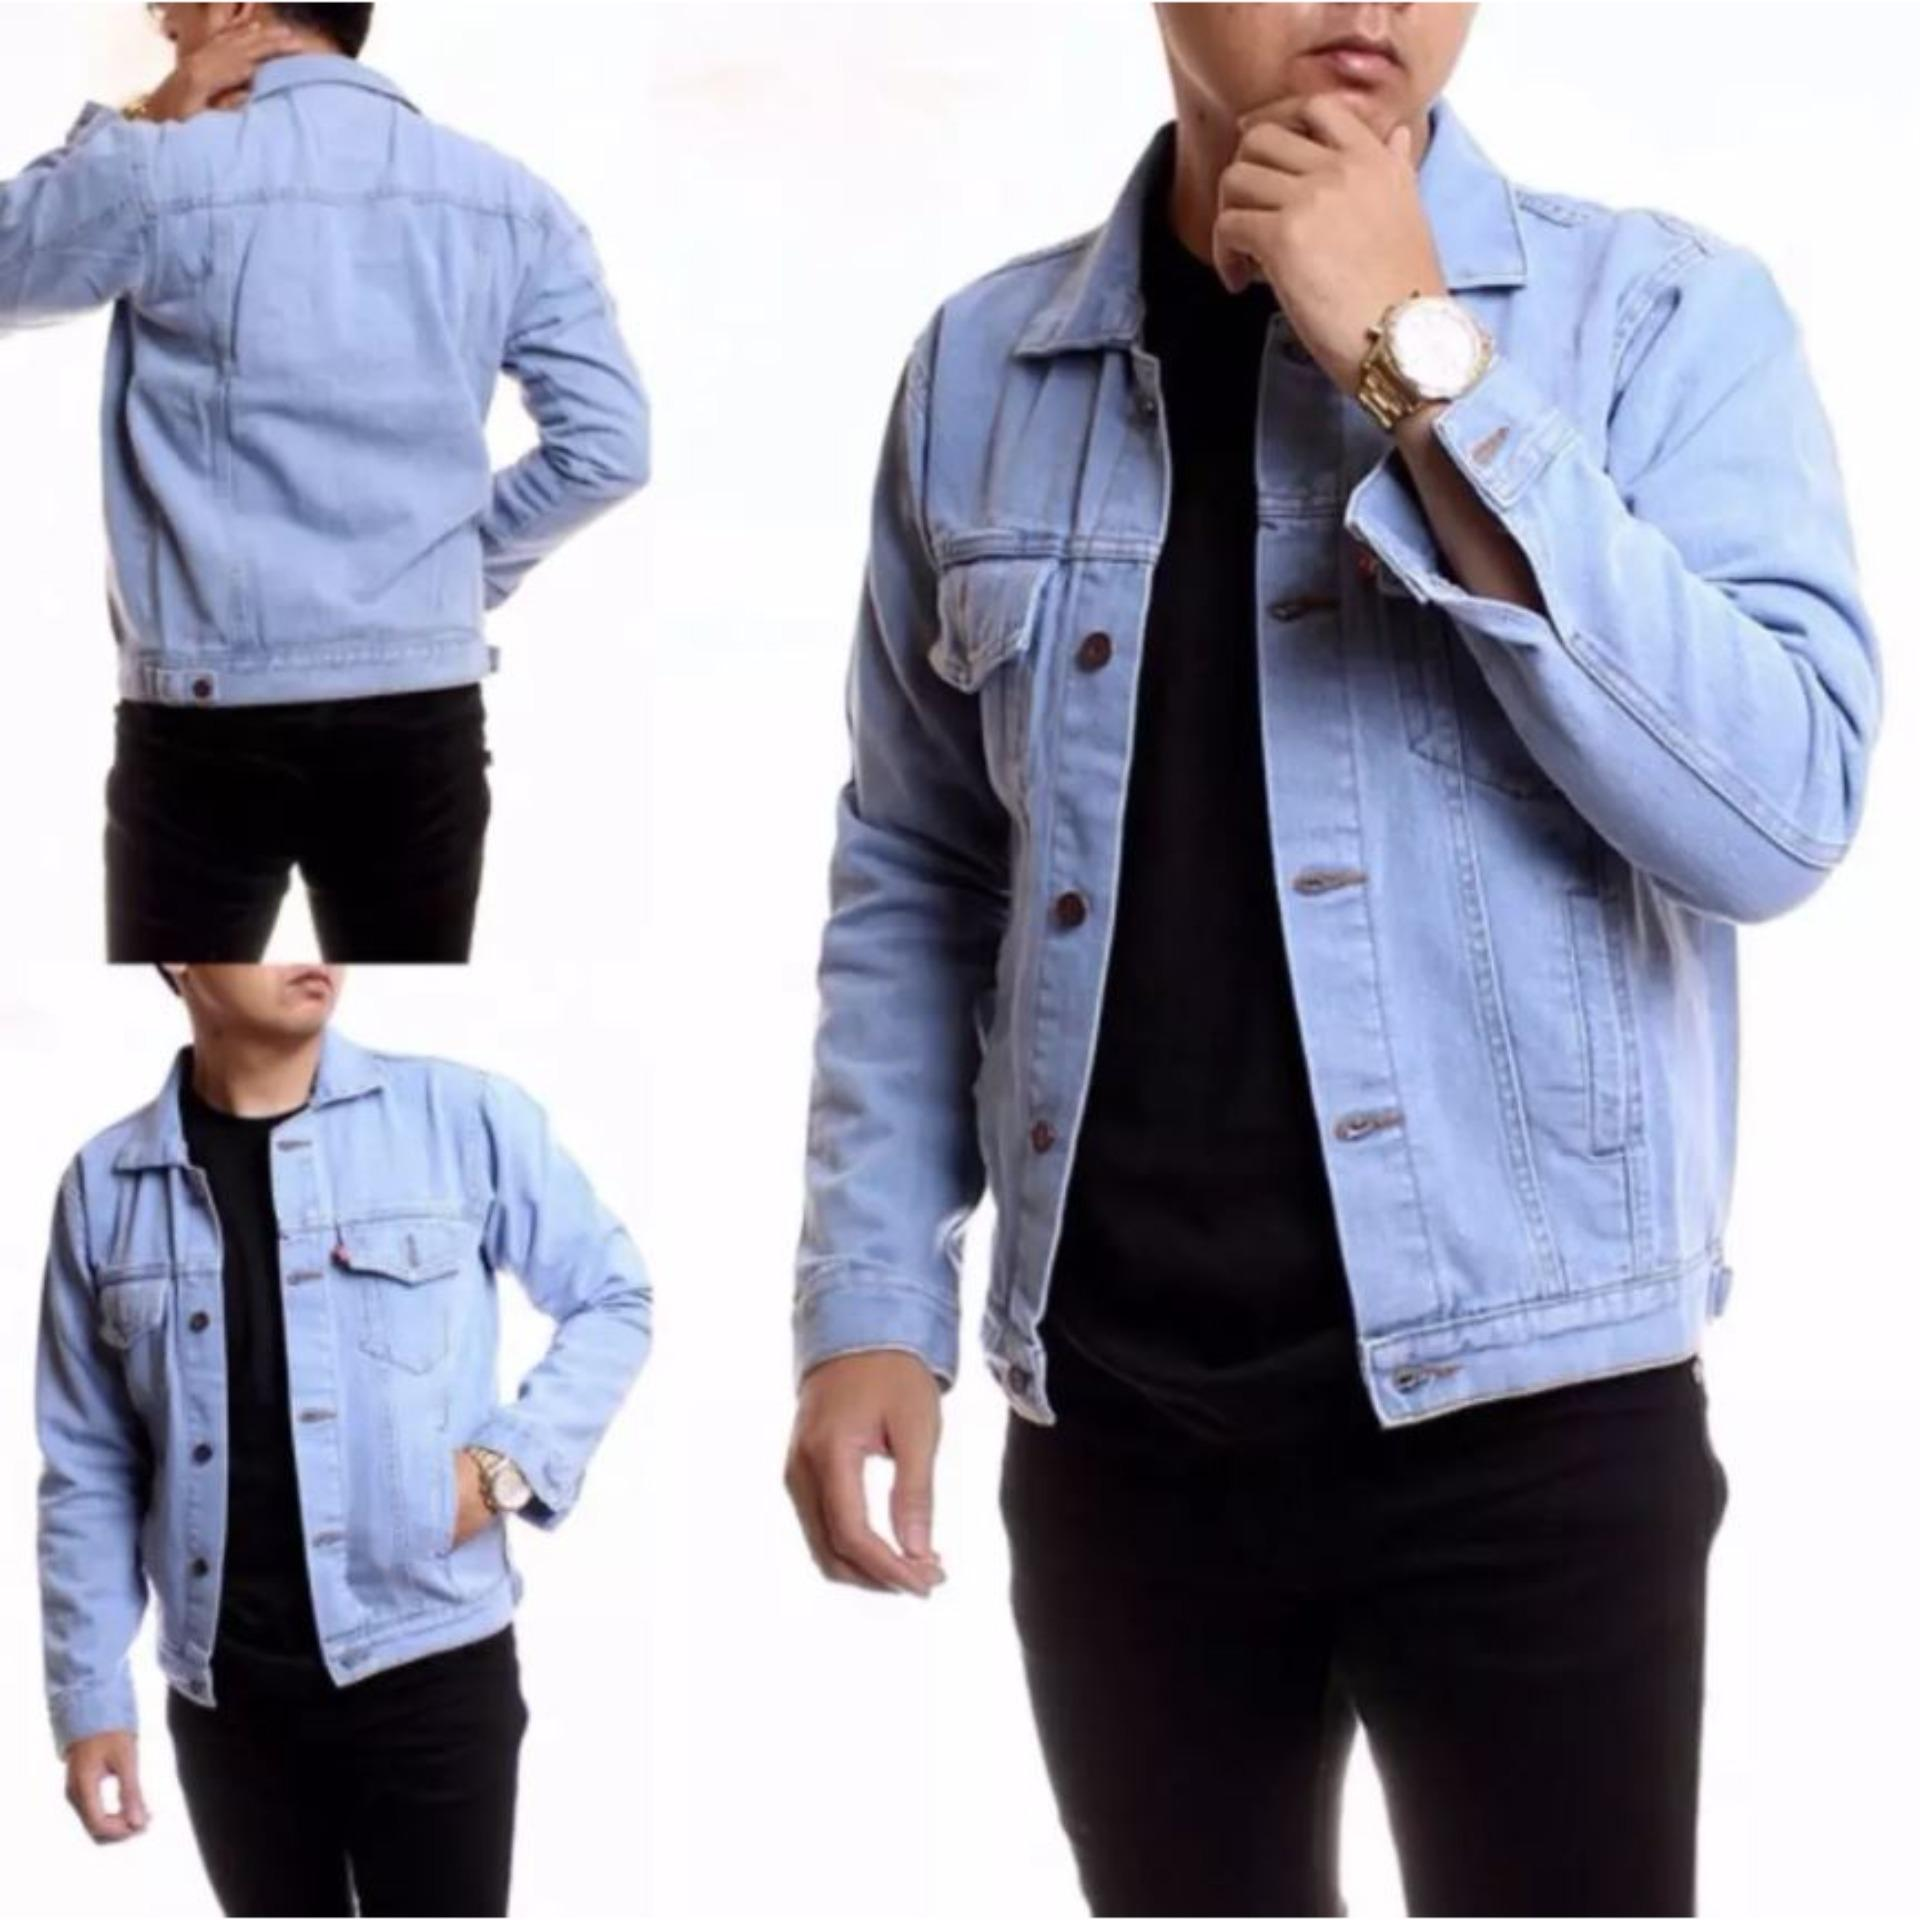 HARGA JUAL AHF Jaket Jeans Denim Pria – Biru Muda (BioBlitz) – Info ... 054b330cb7